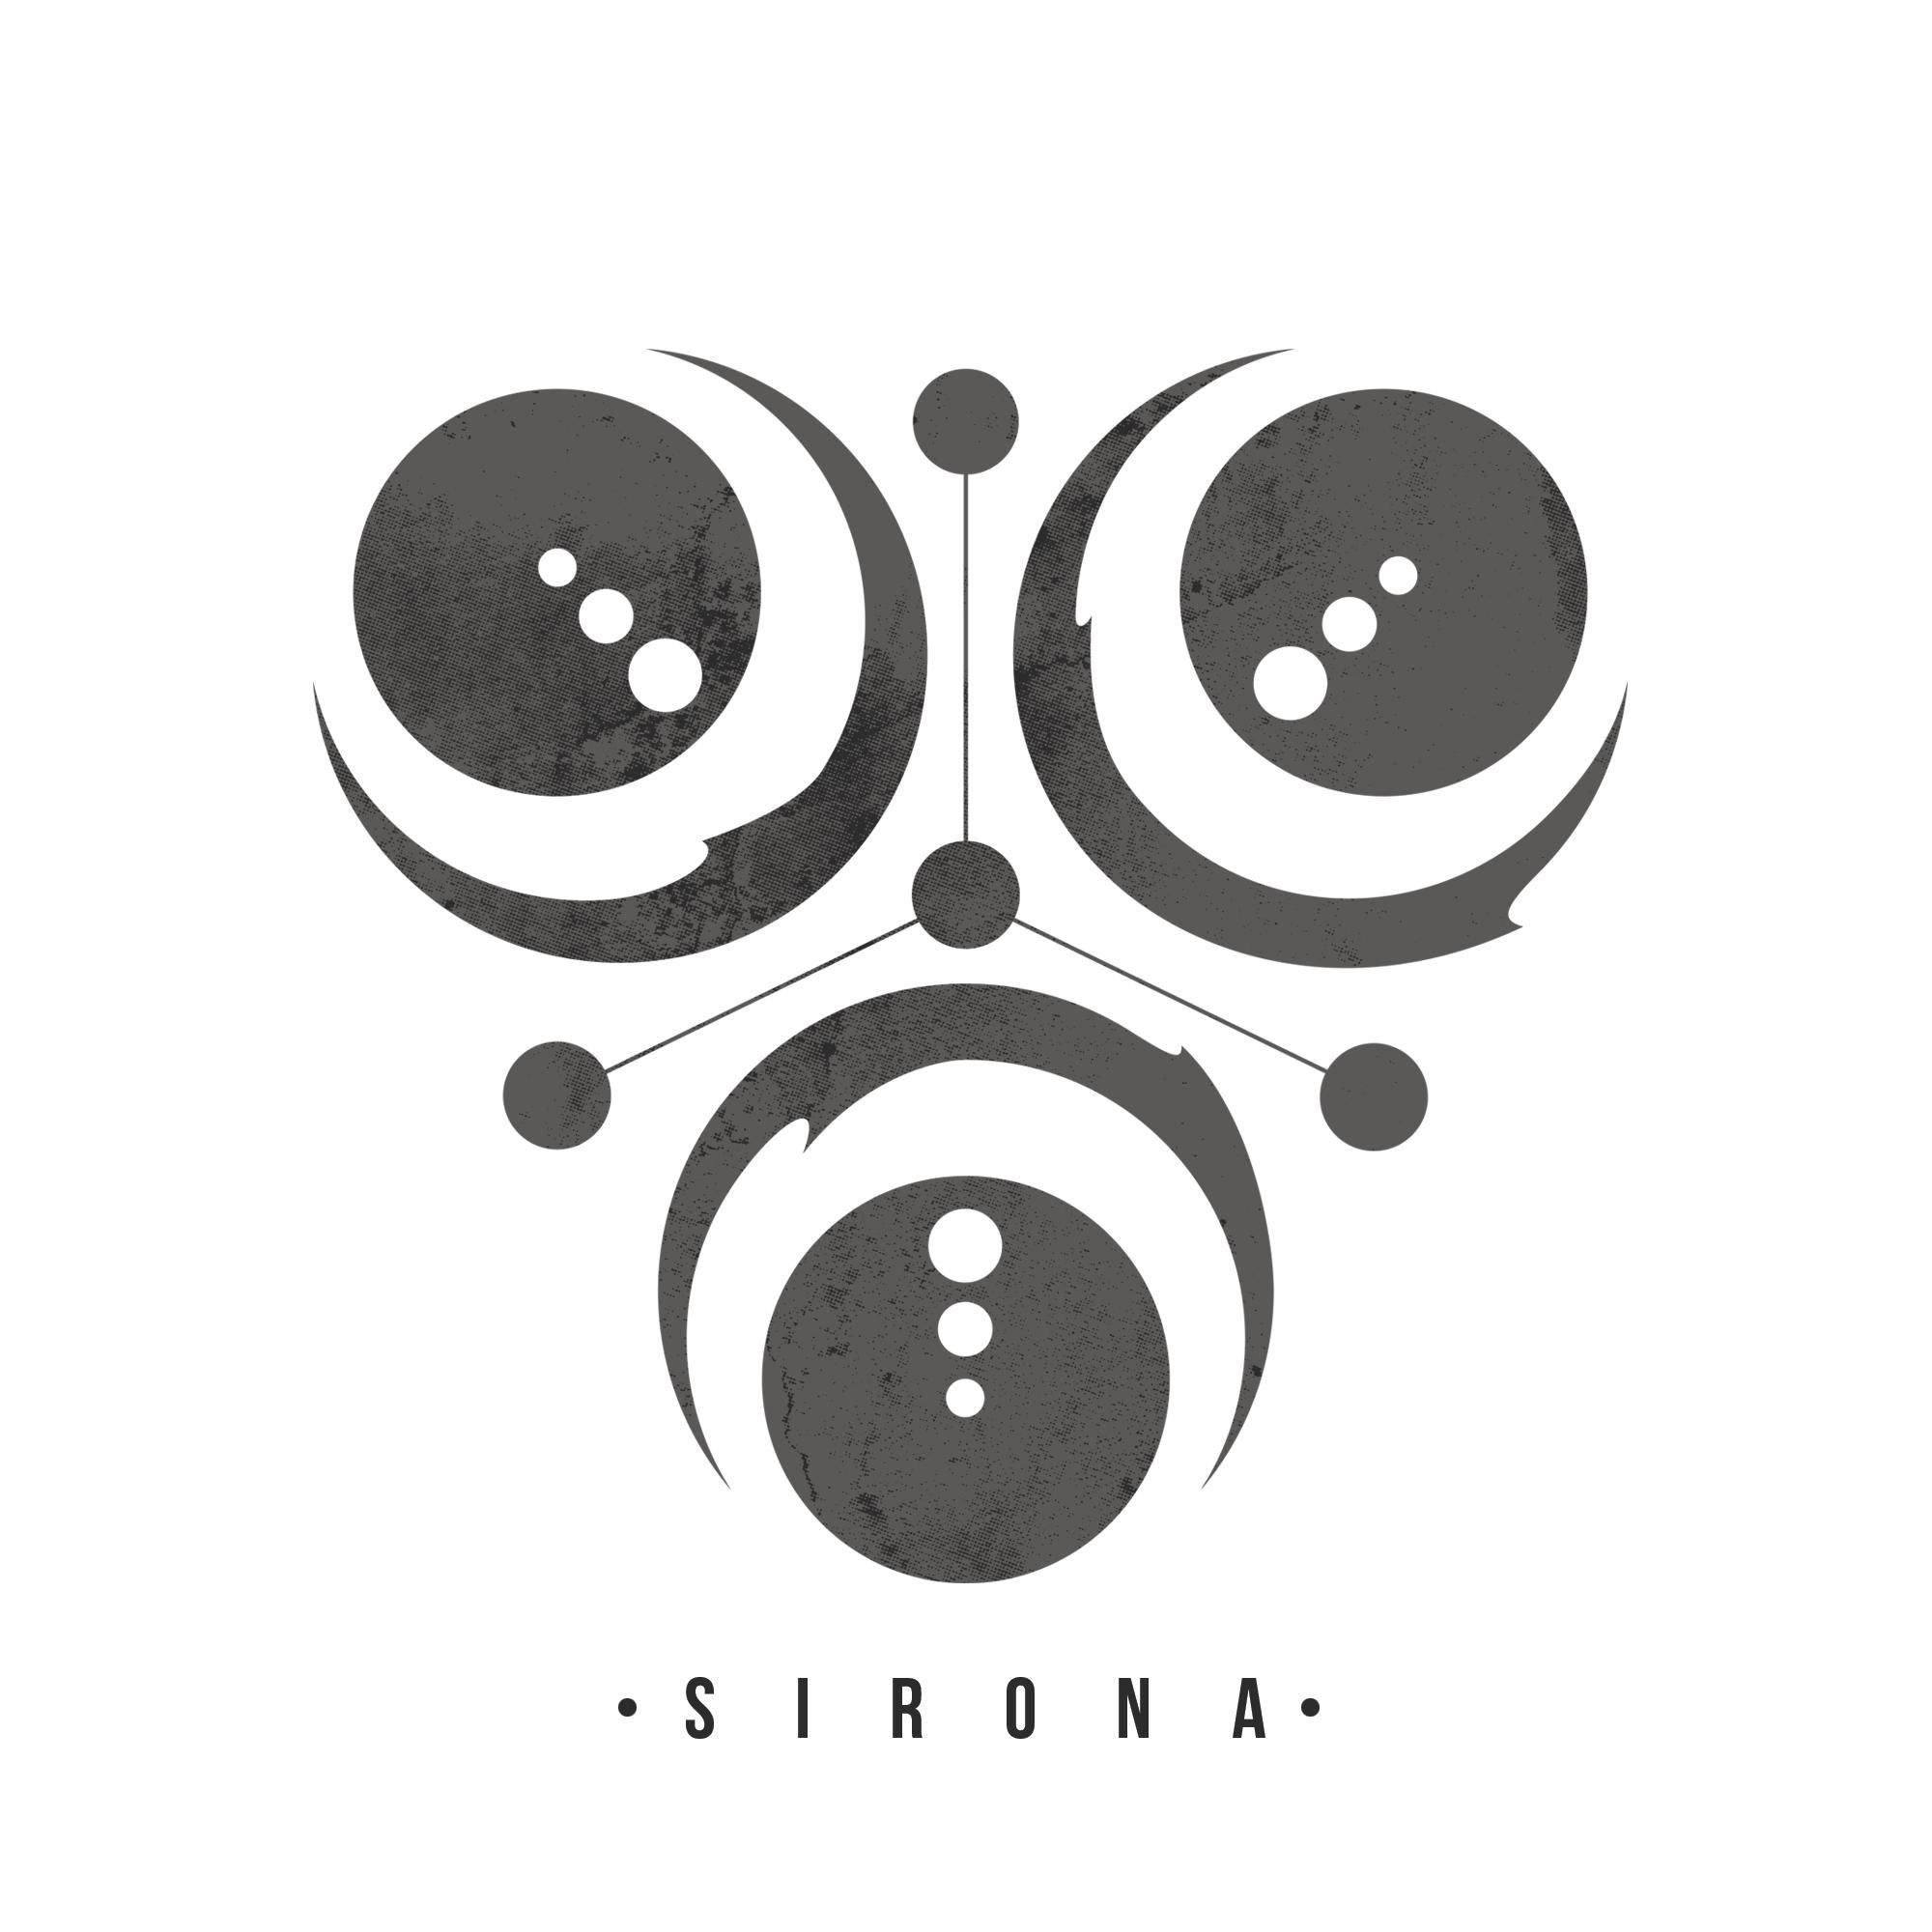 Sirona - Sirona [EP] (2016)